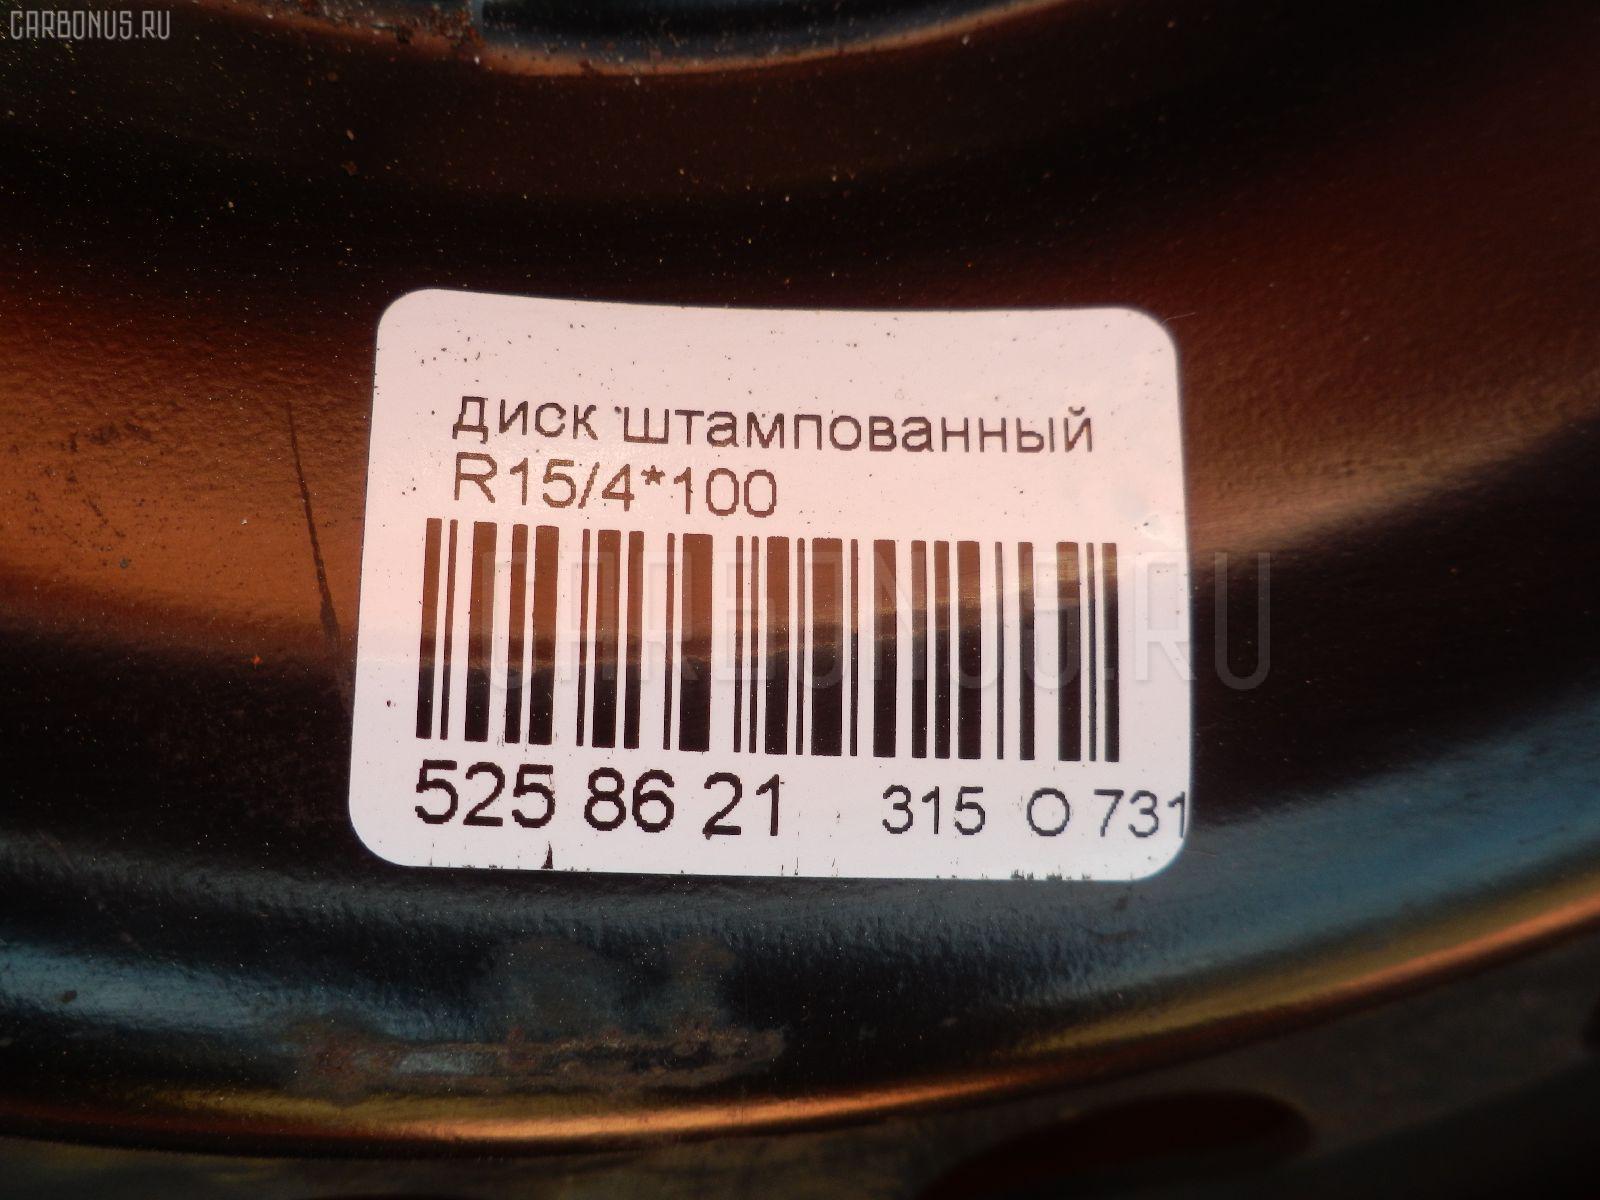 Диск штампованный R15 / 4-100 Фото 2